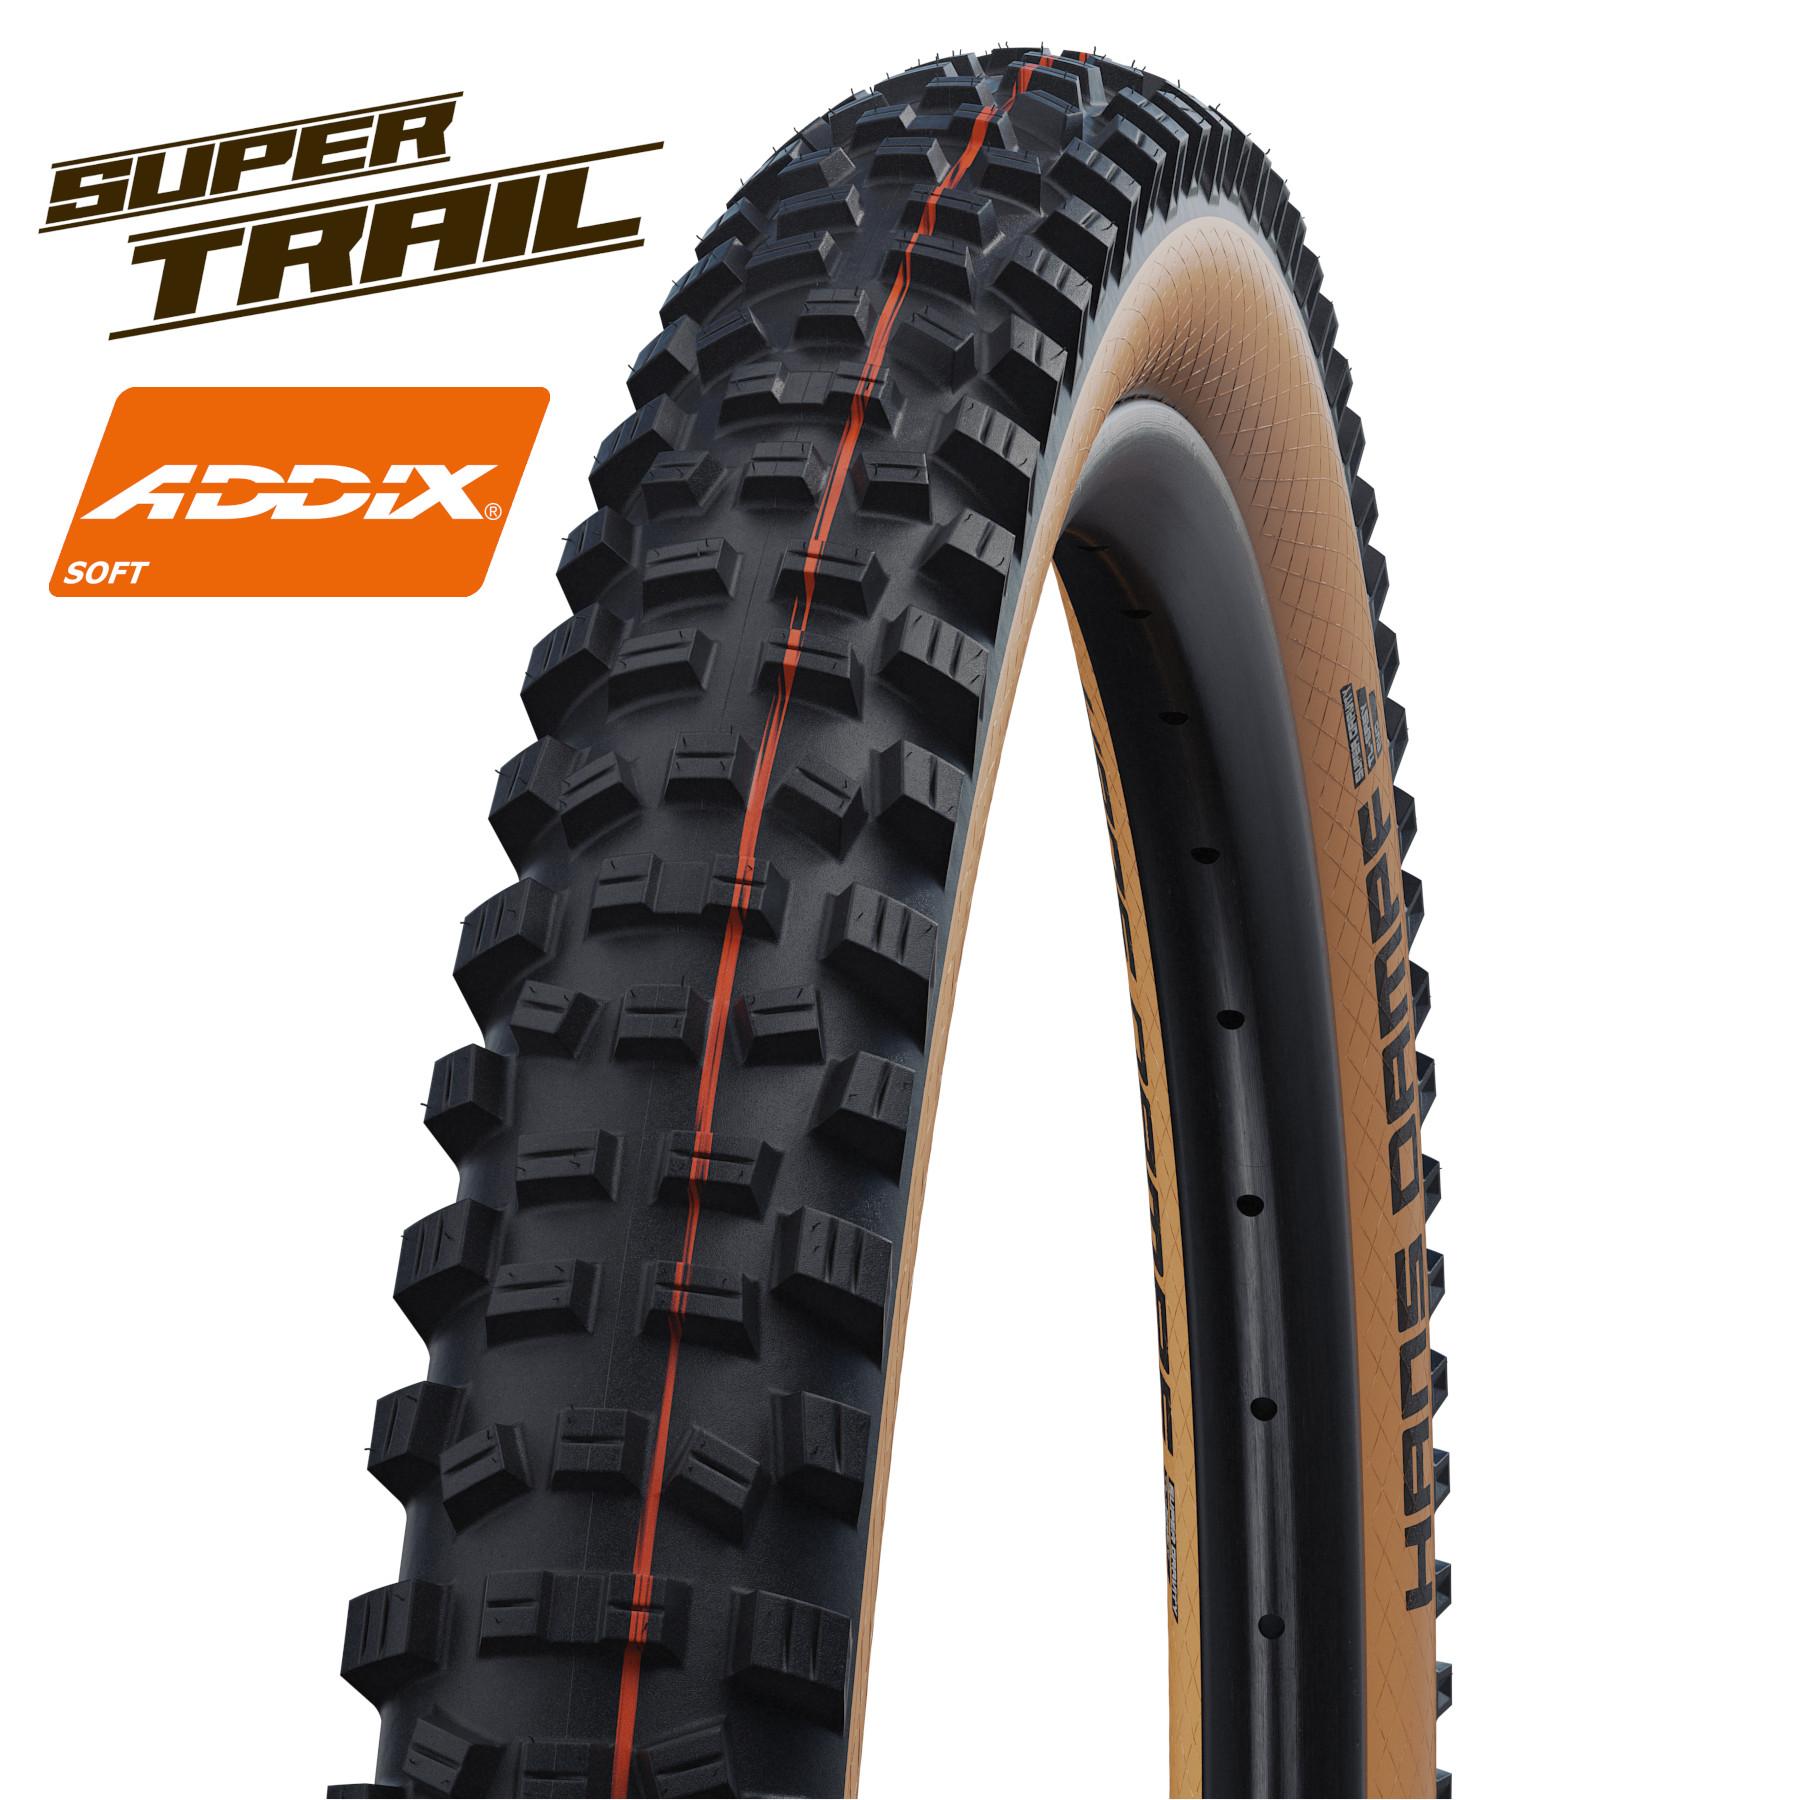 Picture of Schwalbe Hans Dampf Evolution MTB Folding Tire - AddixSoft - SuperTrail - TLEasy - E-25 - 29x2.6 Inches - Classic-Skin